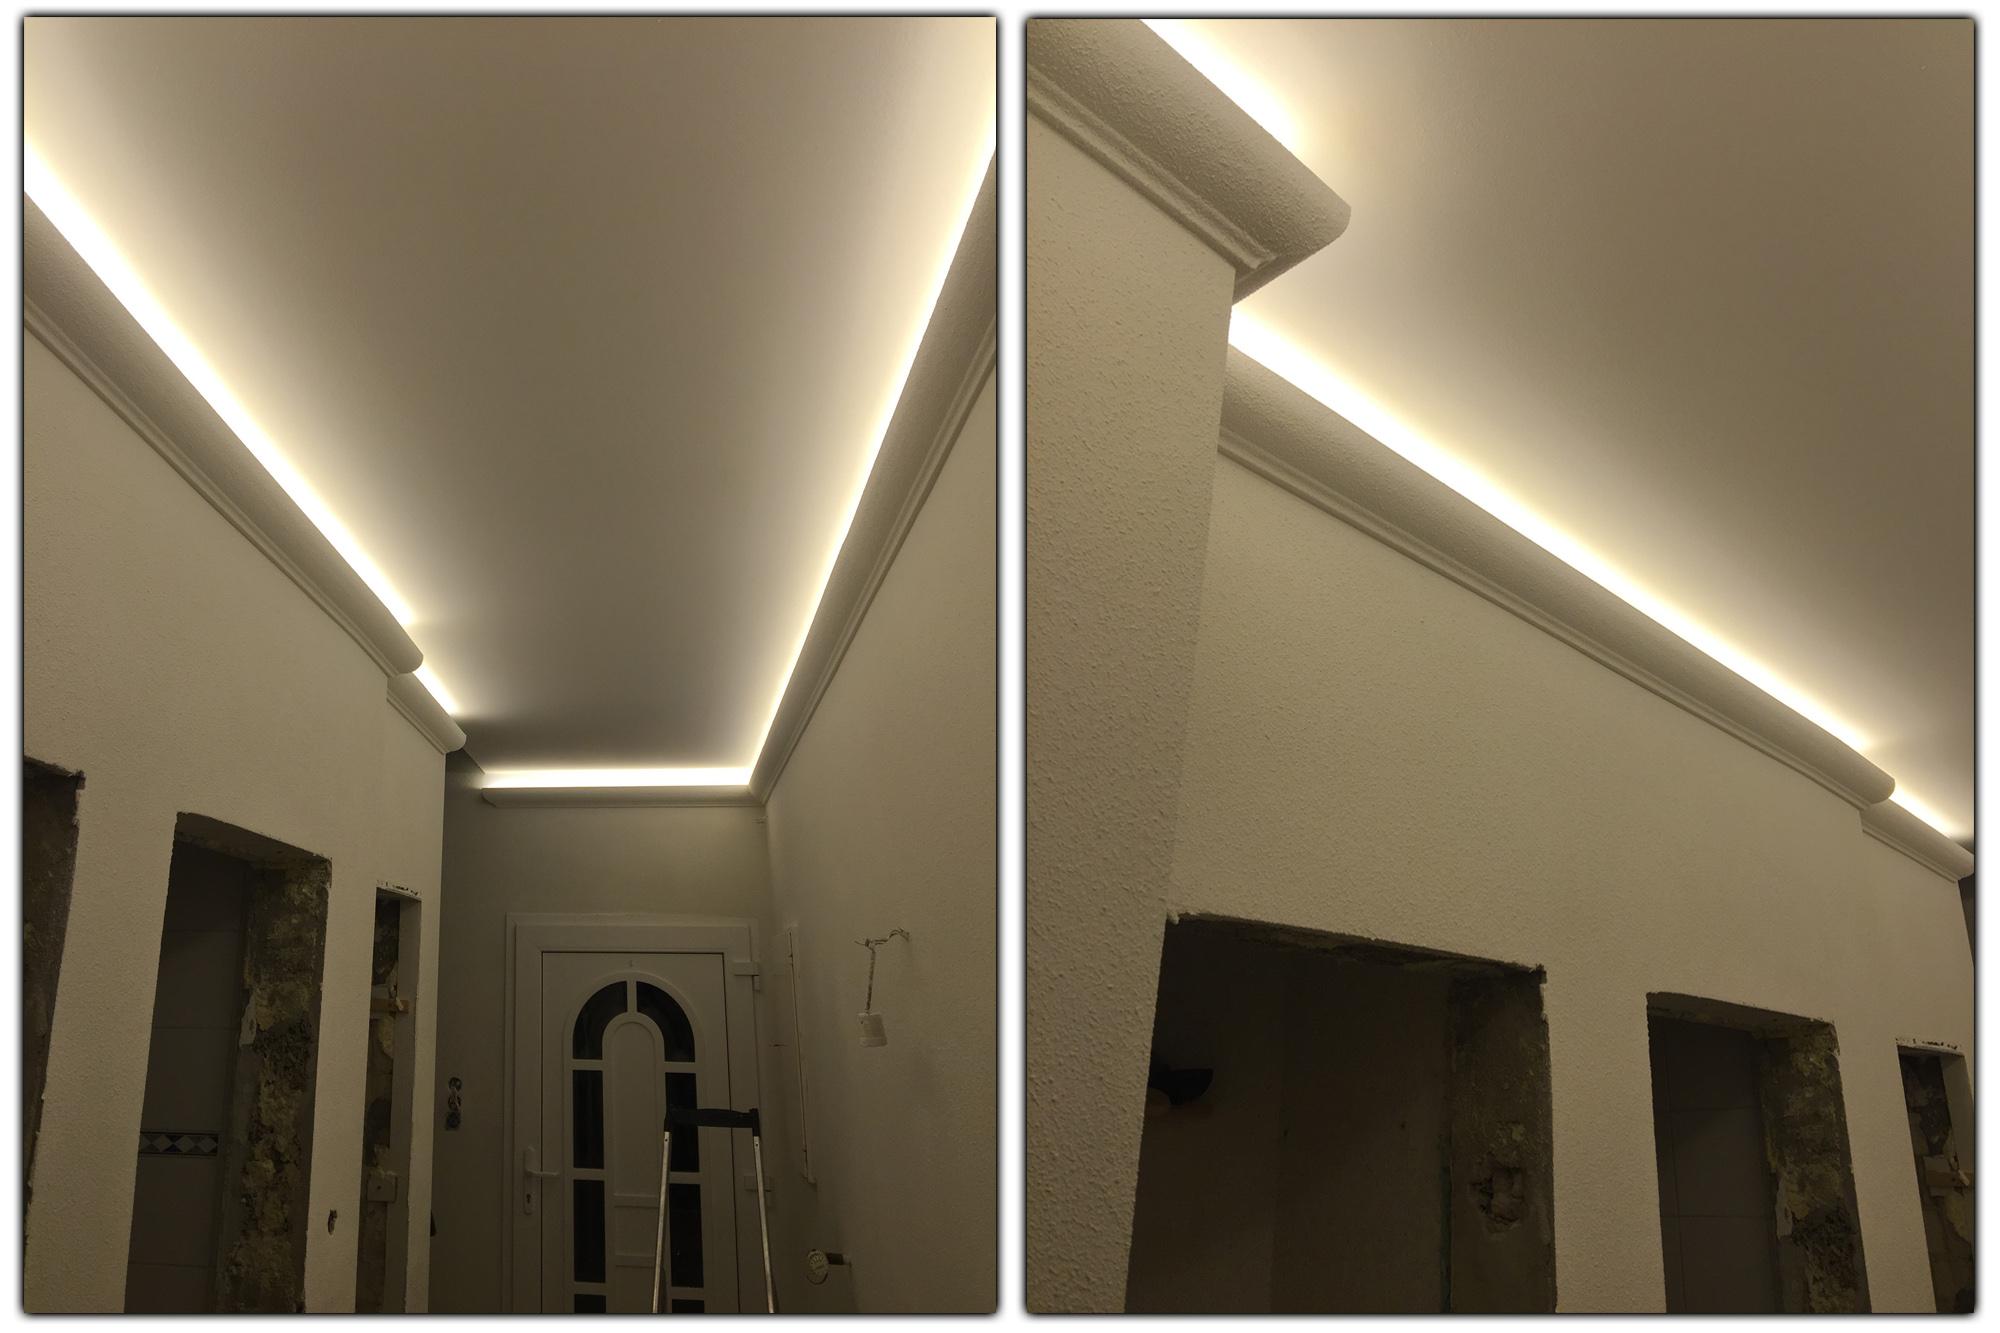 2 meter led profil pu stuckleiste f r indirekte beleuchtung zierleiste dekor sto fest 80x70 ek. Black Bedroom Furniture Sets. Home Design Ideas